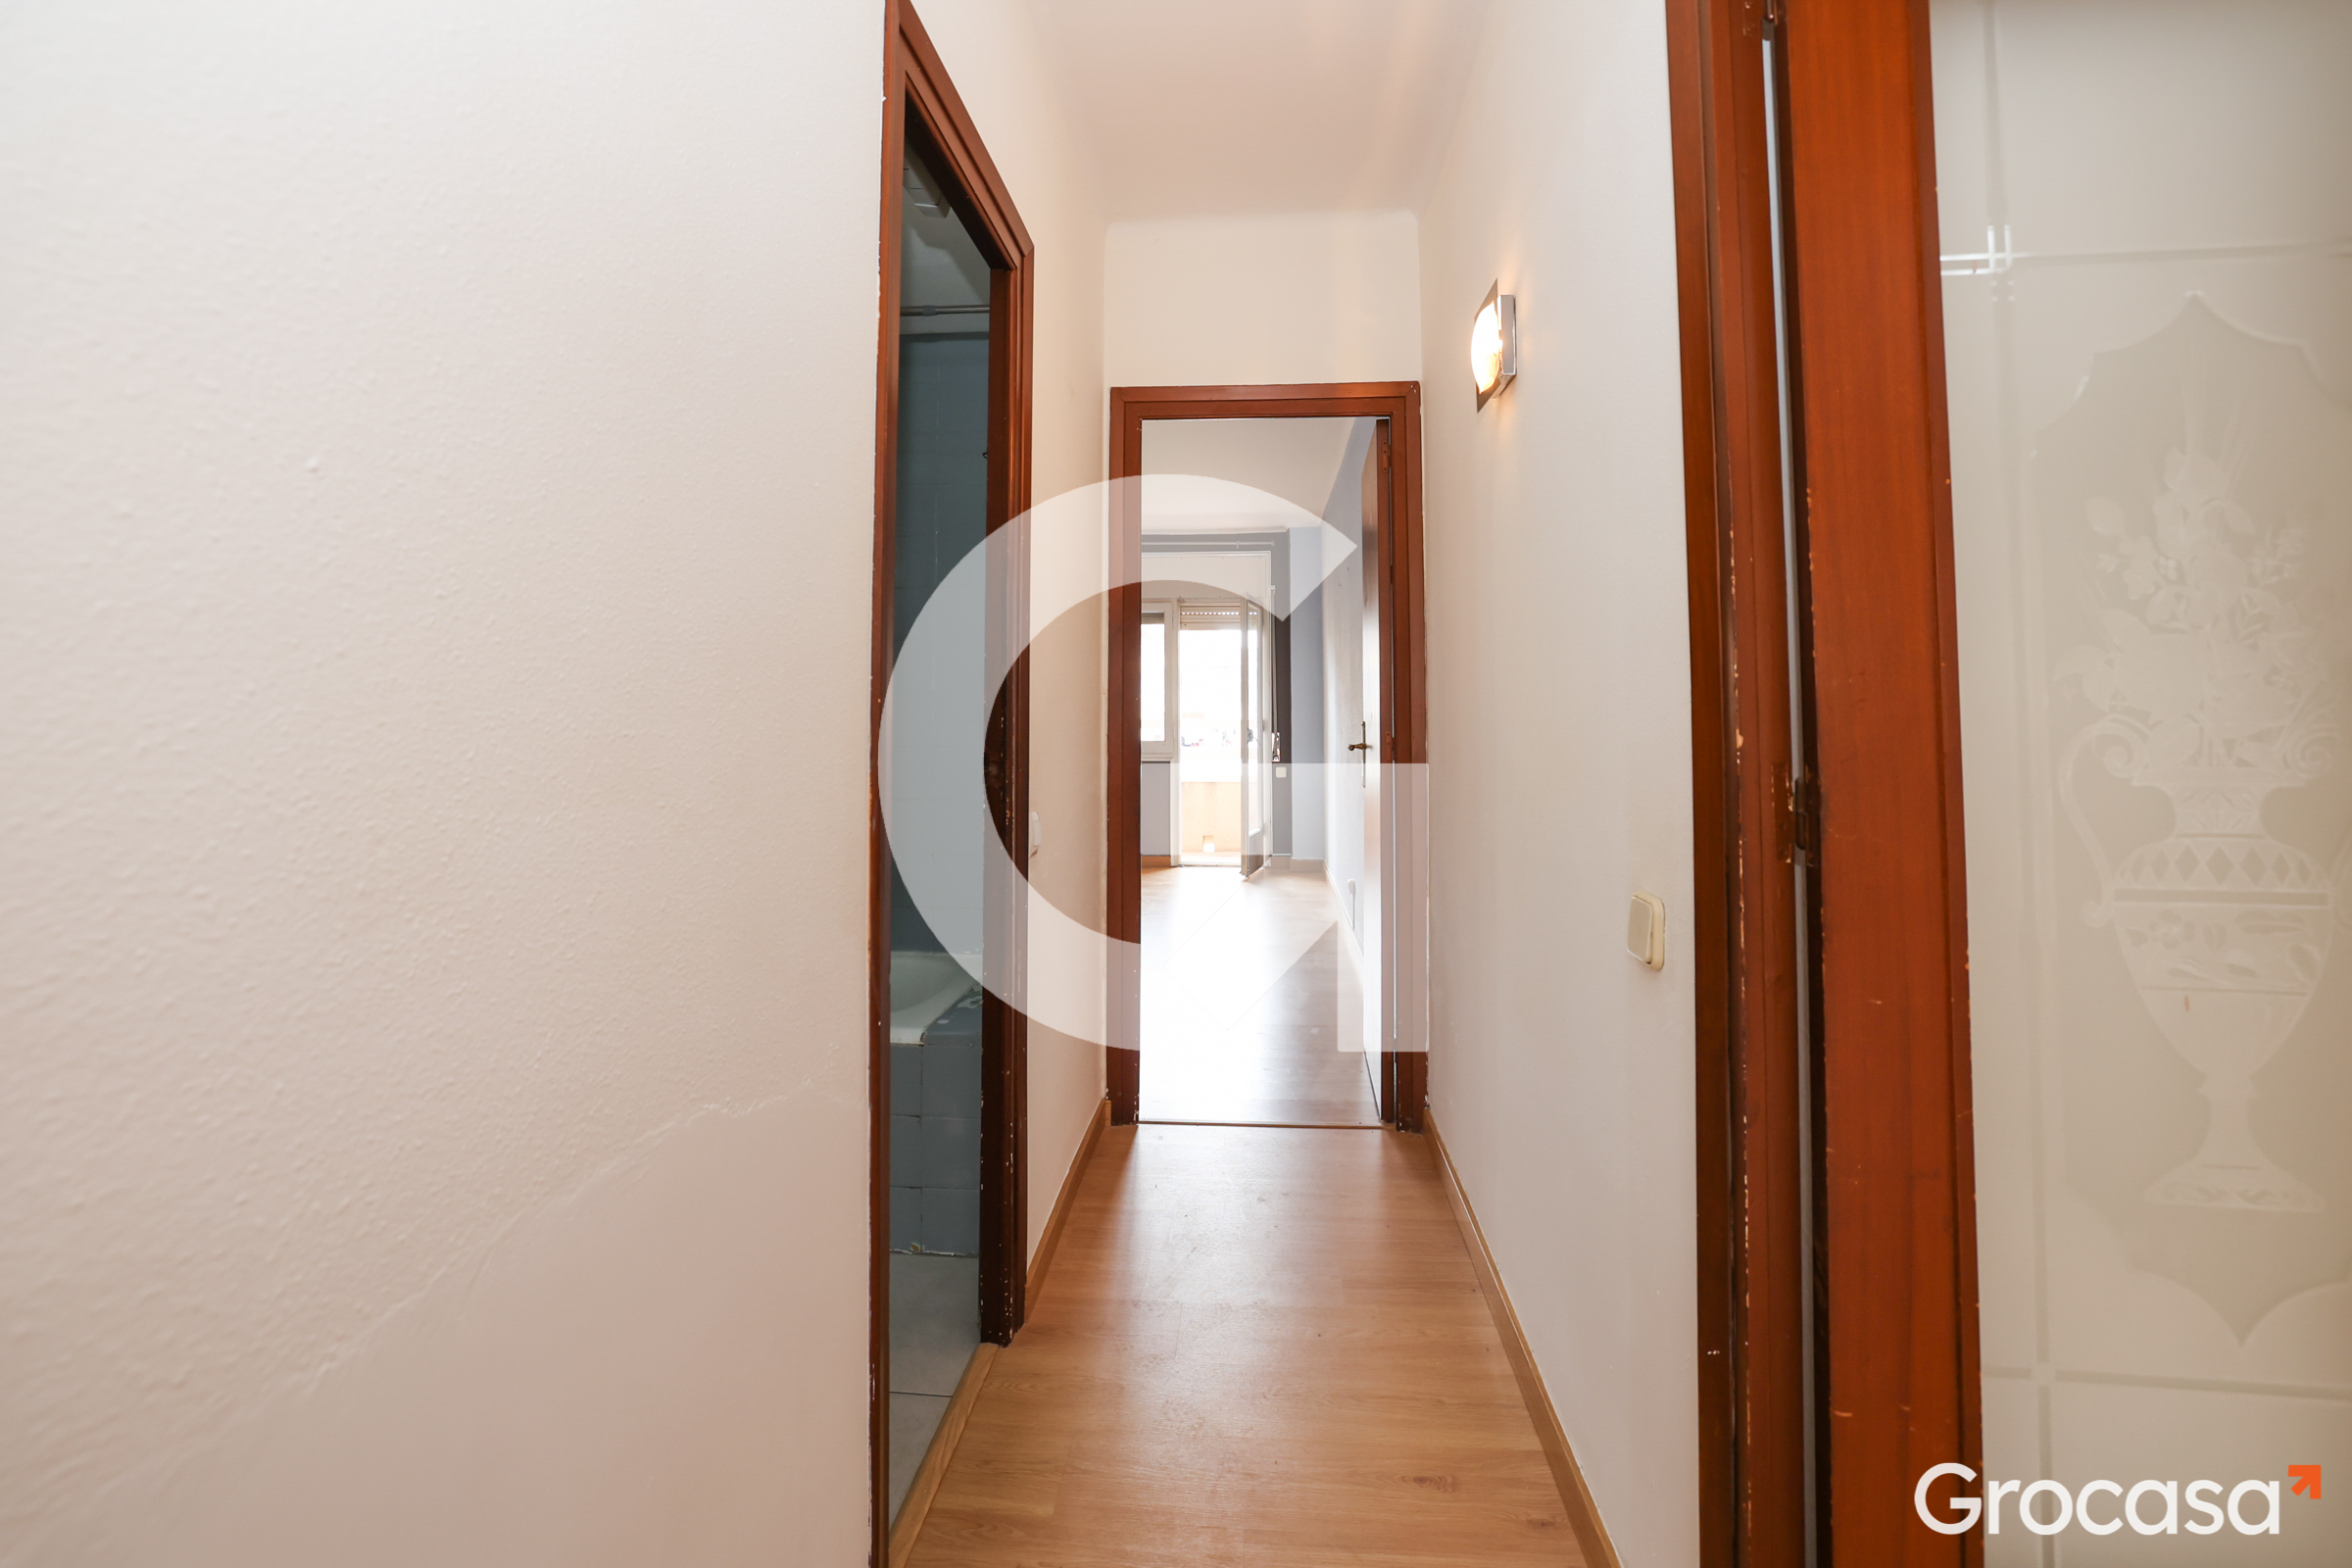 Piso en Vinyets moli vell en Sant Boi de Llobregat en Venta por 234.000€